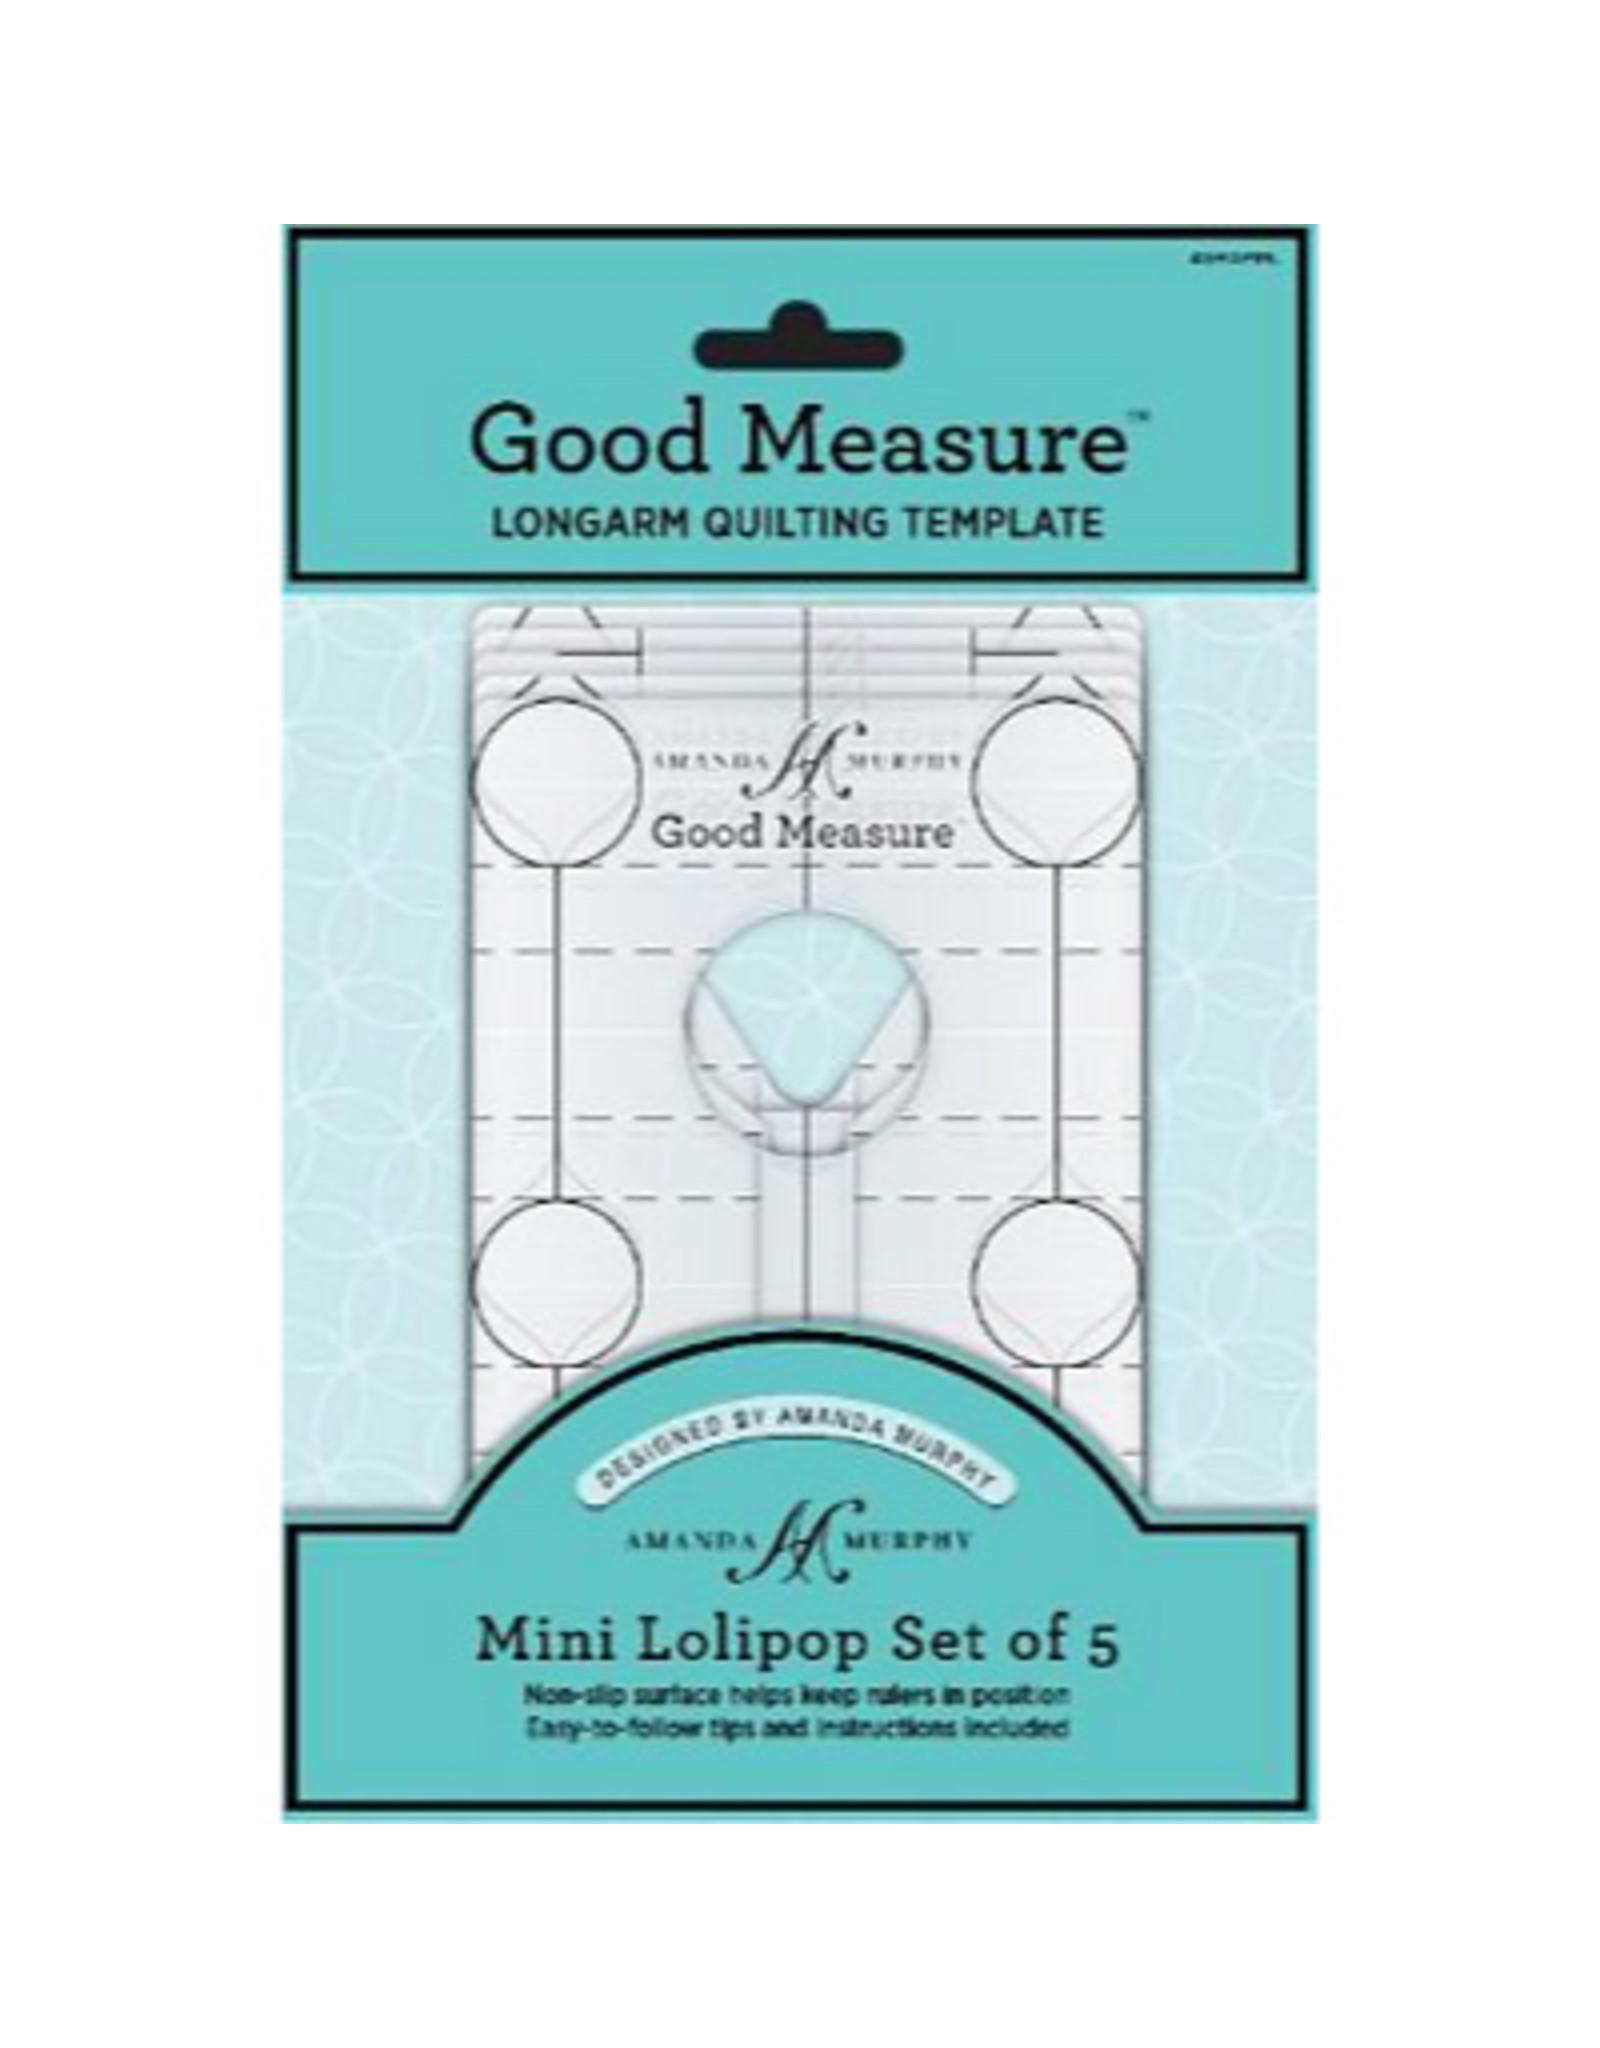 Amanda Murphy - Good Measure Quilting Templates - Mini Lollipop Set